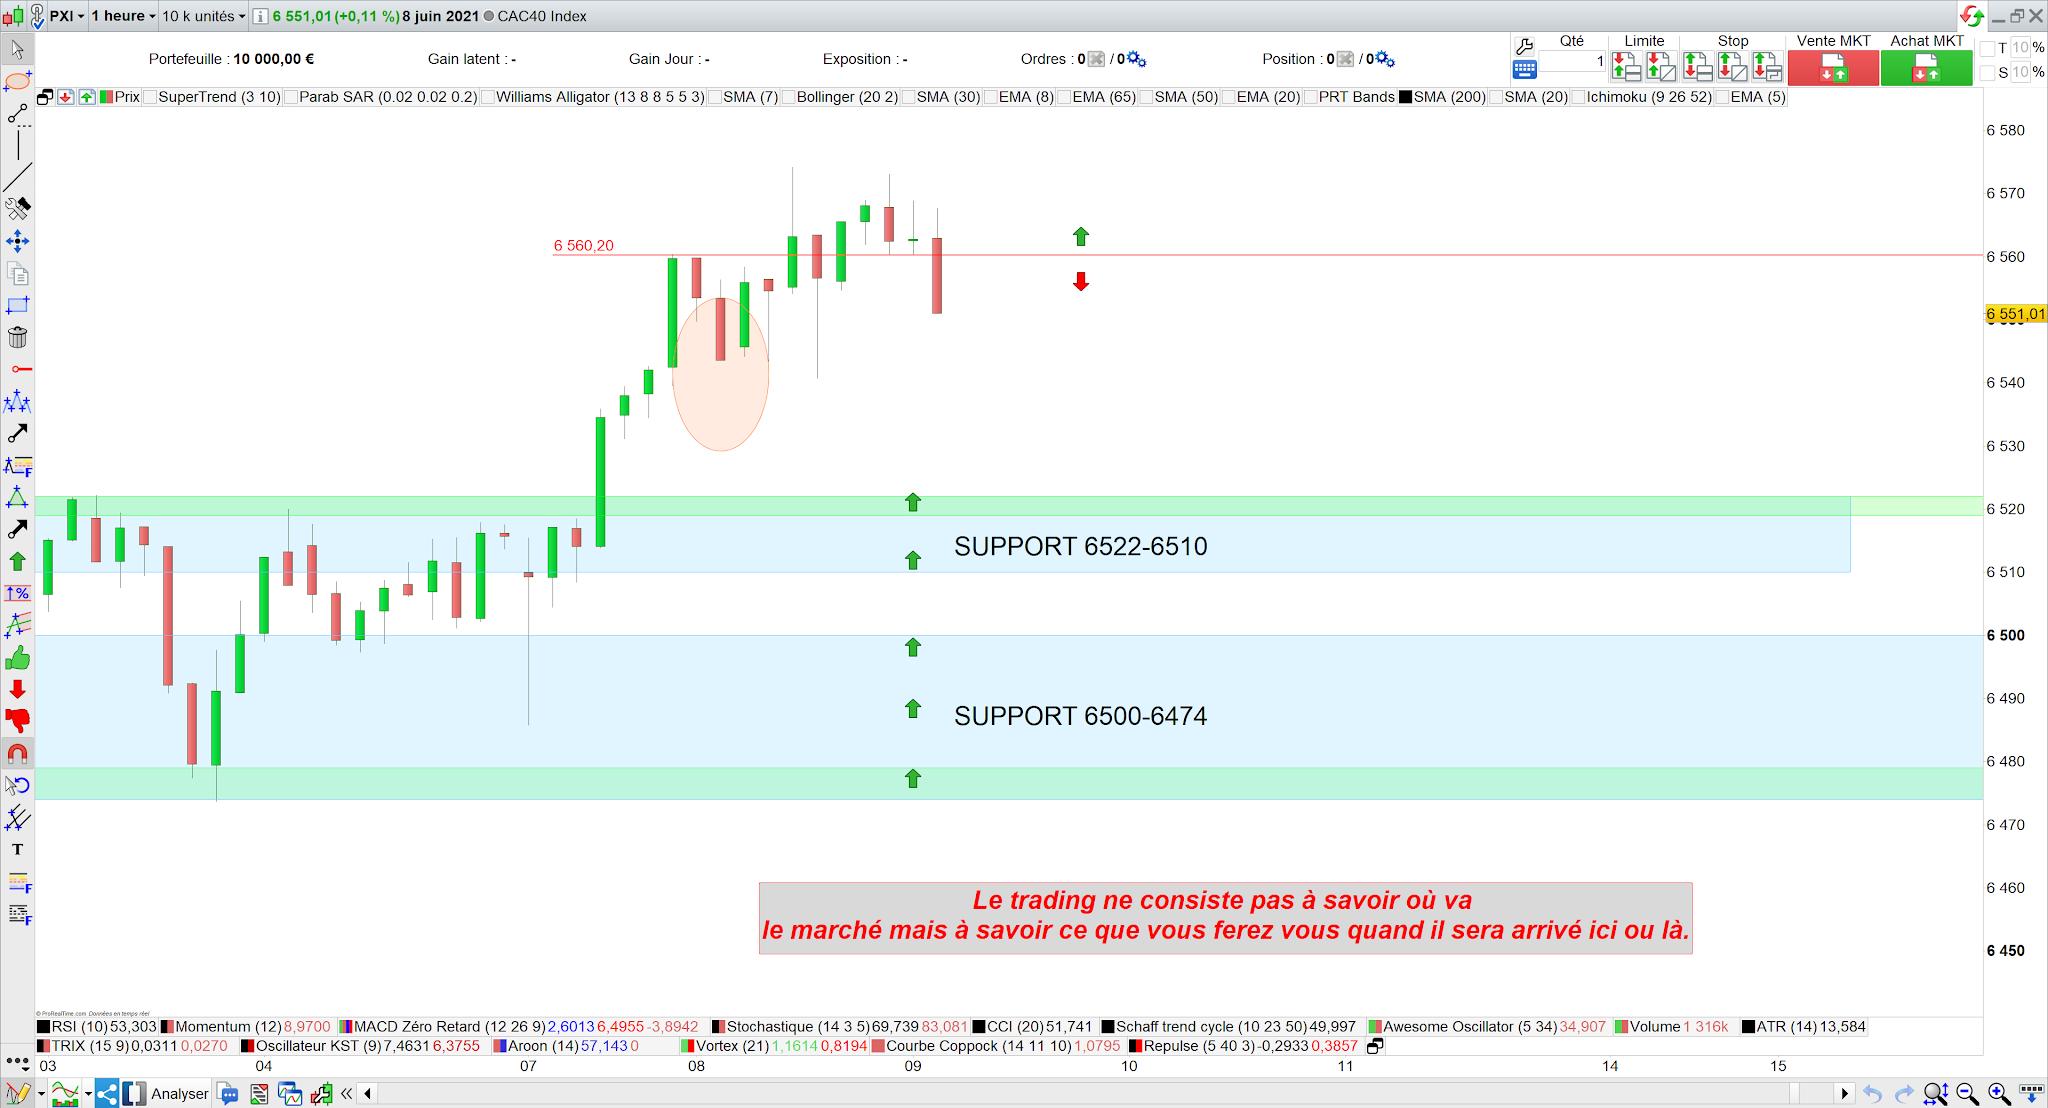 trading cac40 intraday 8 juin 21 bilan